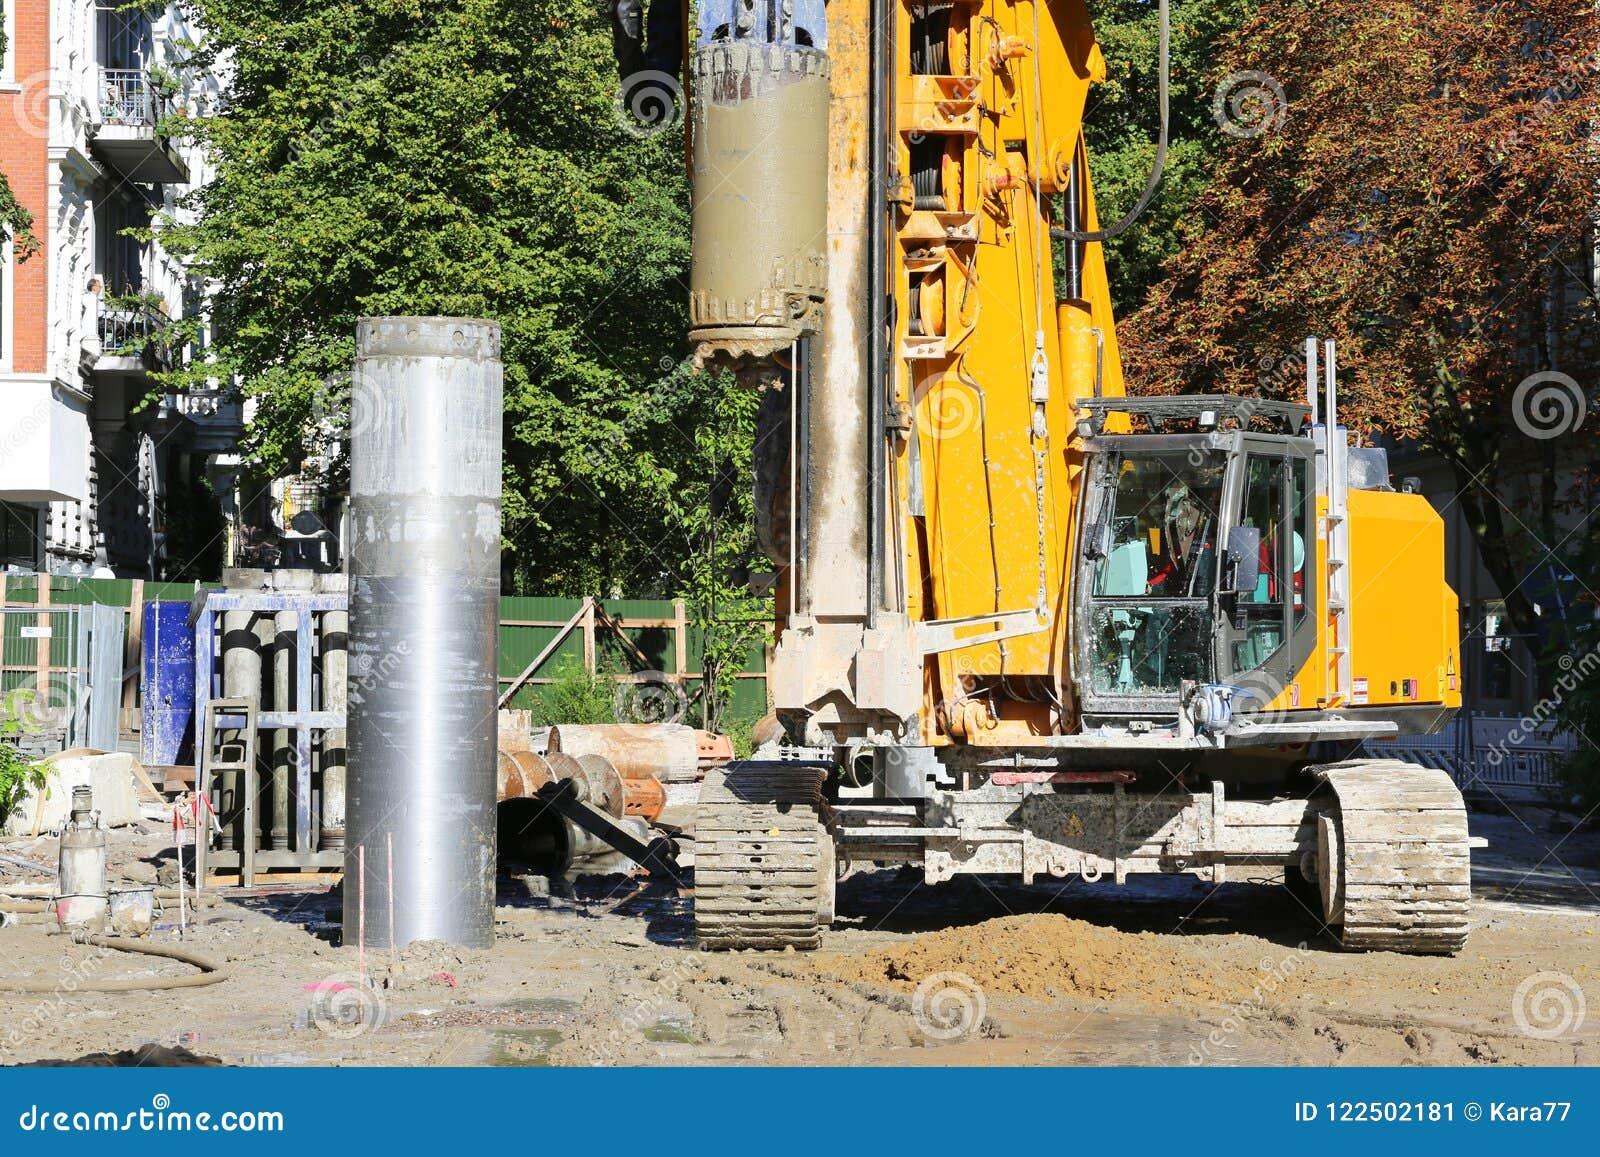 Drilling_rig